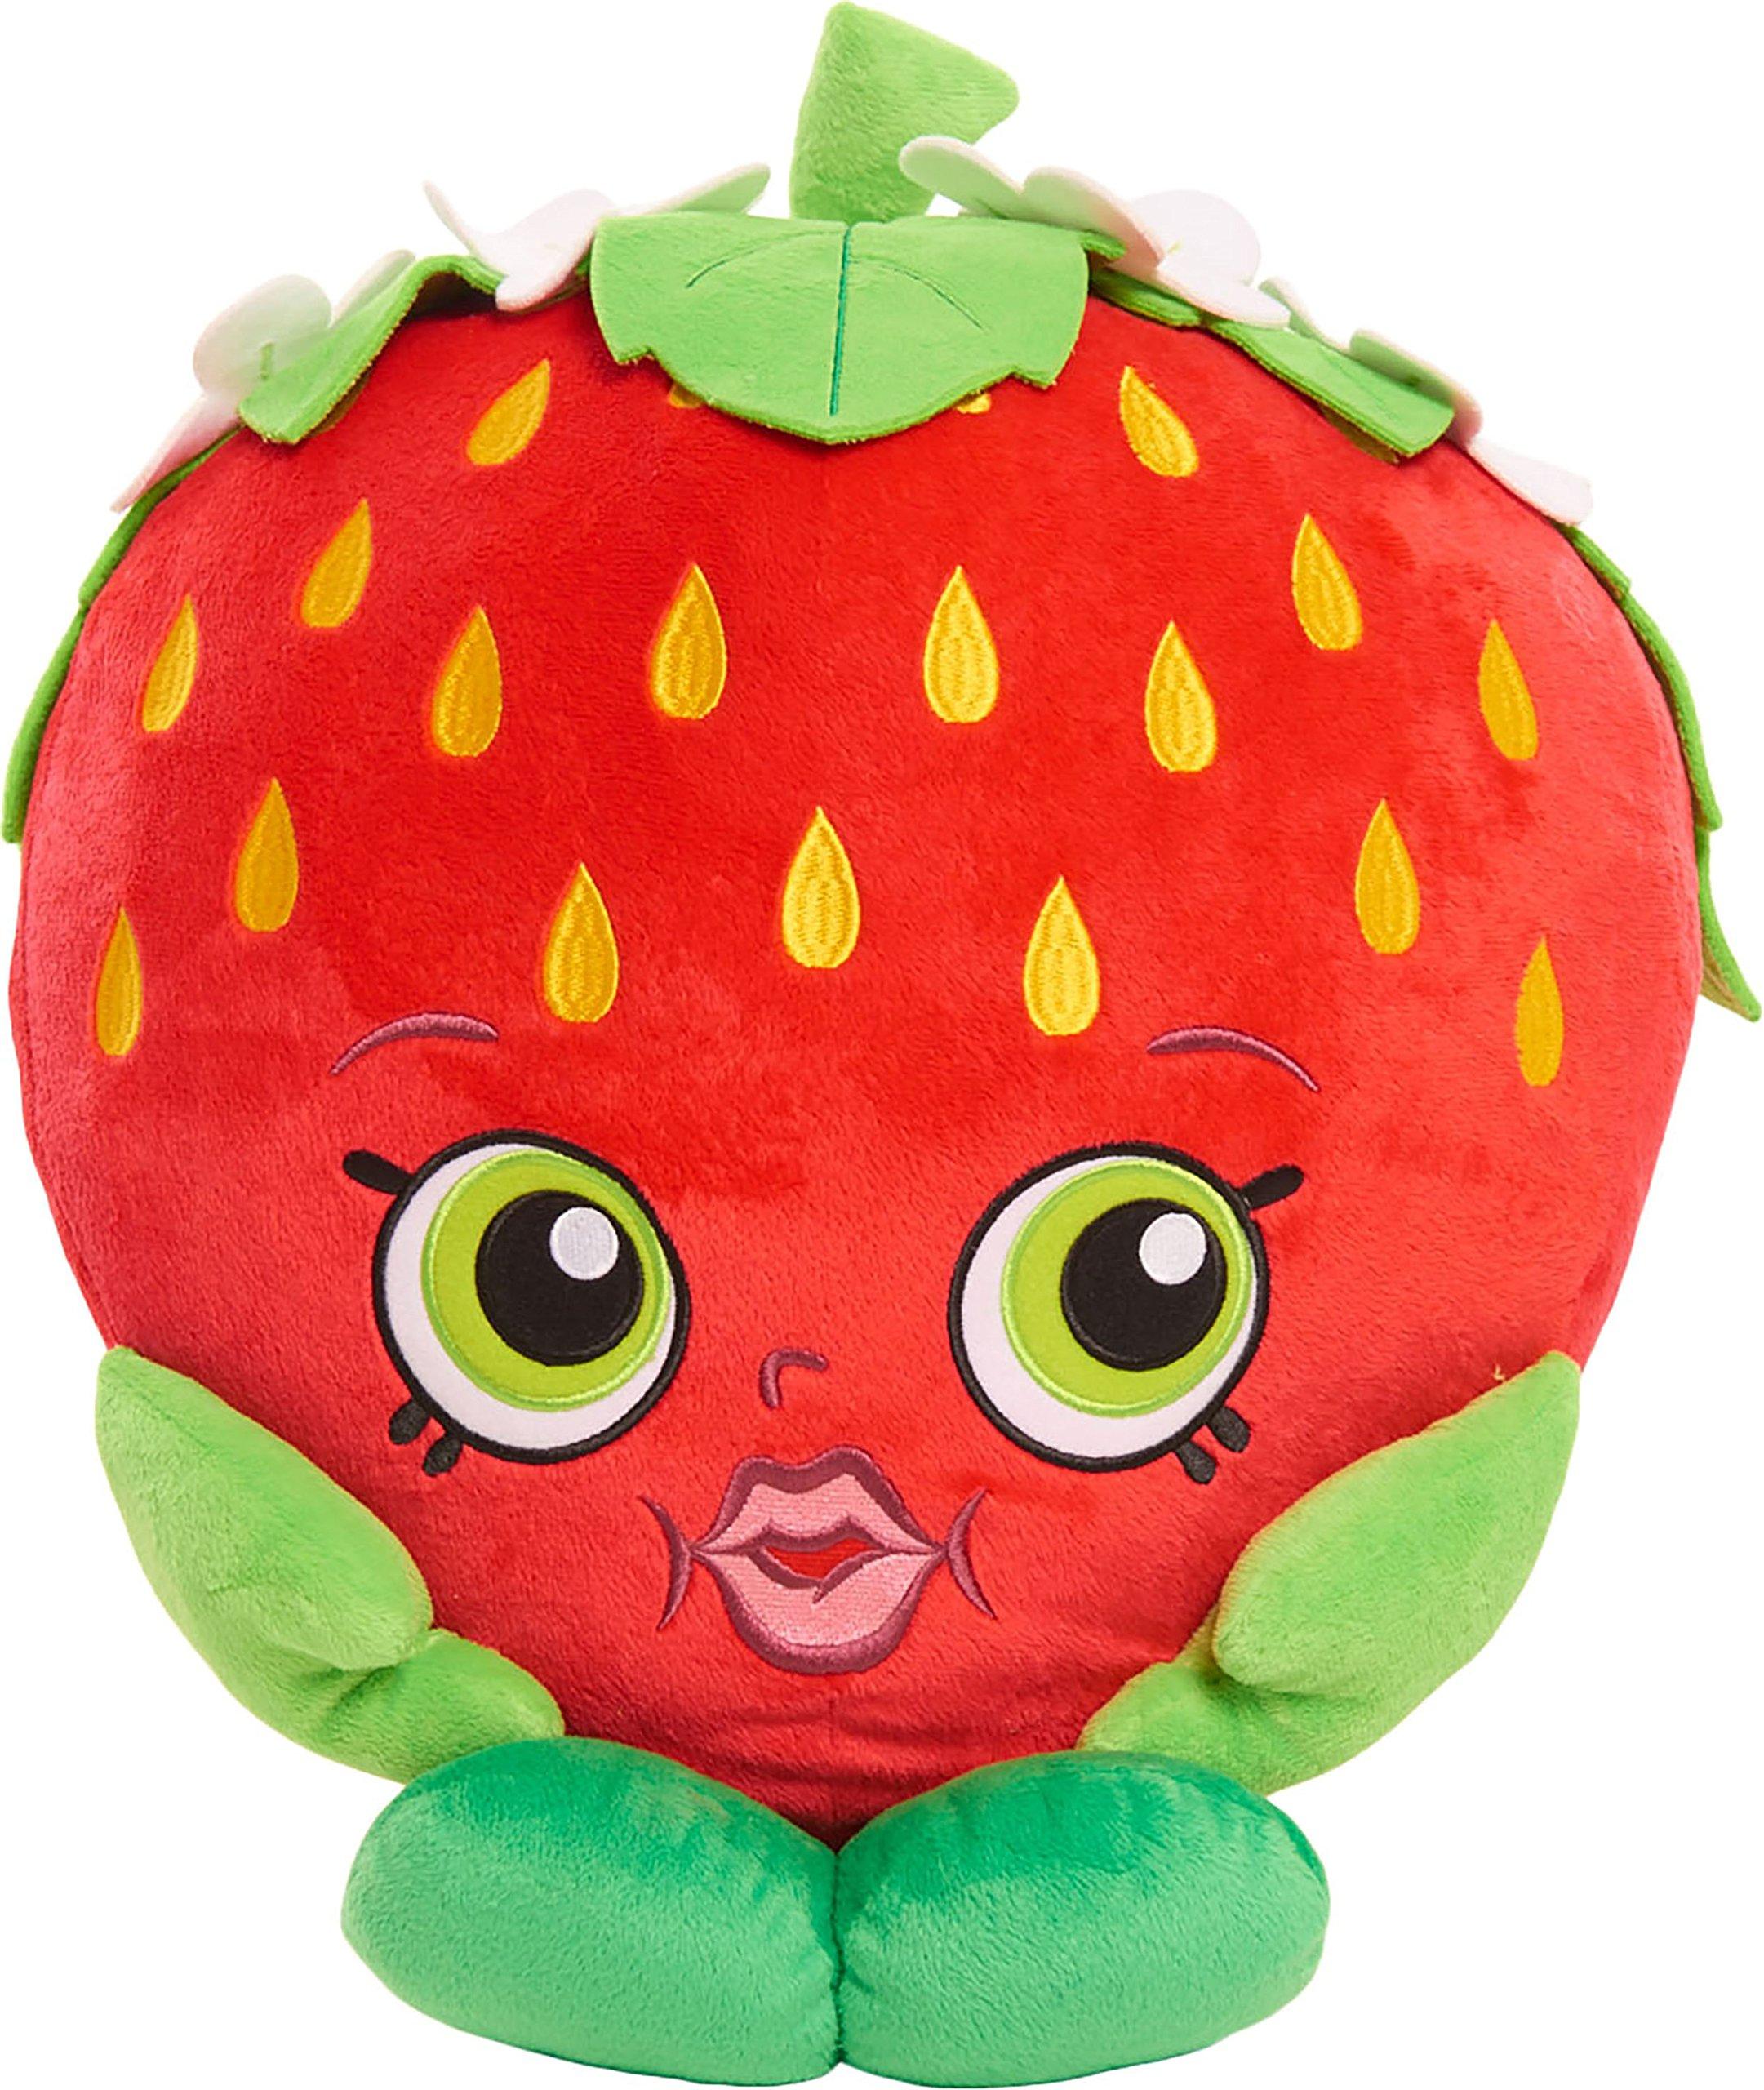 Shopkins Jumbo Strawberry Kiss Plush by Shopkins